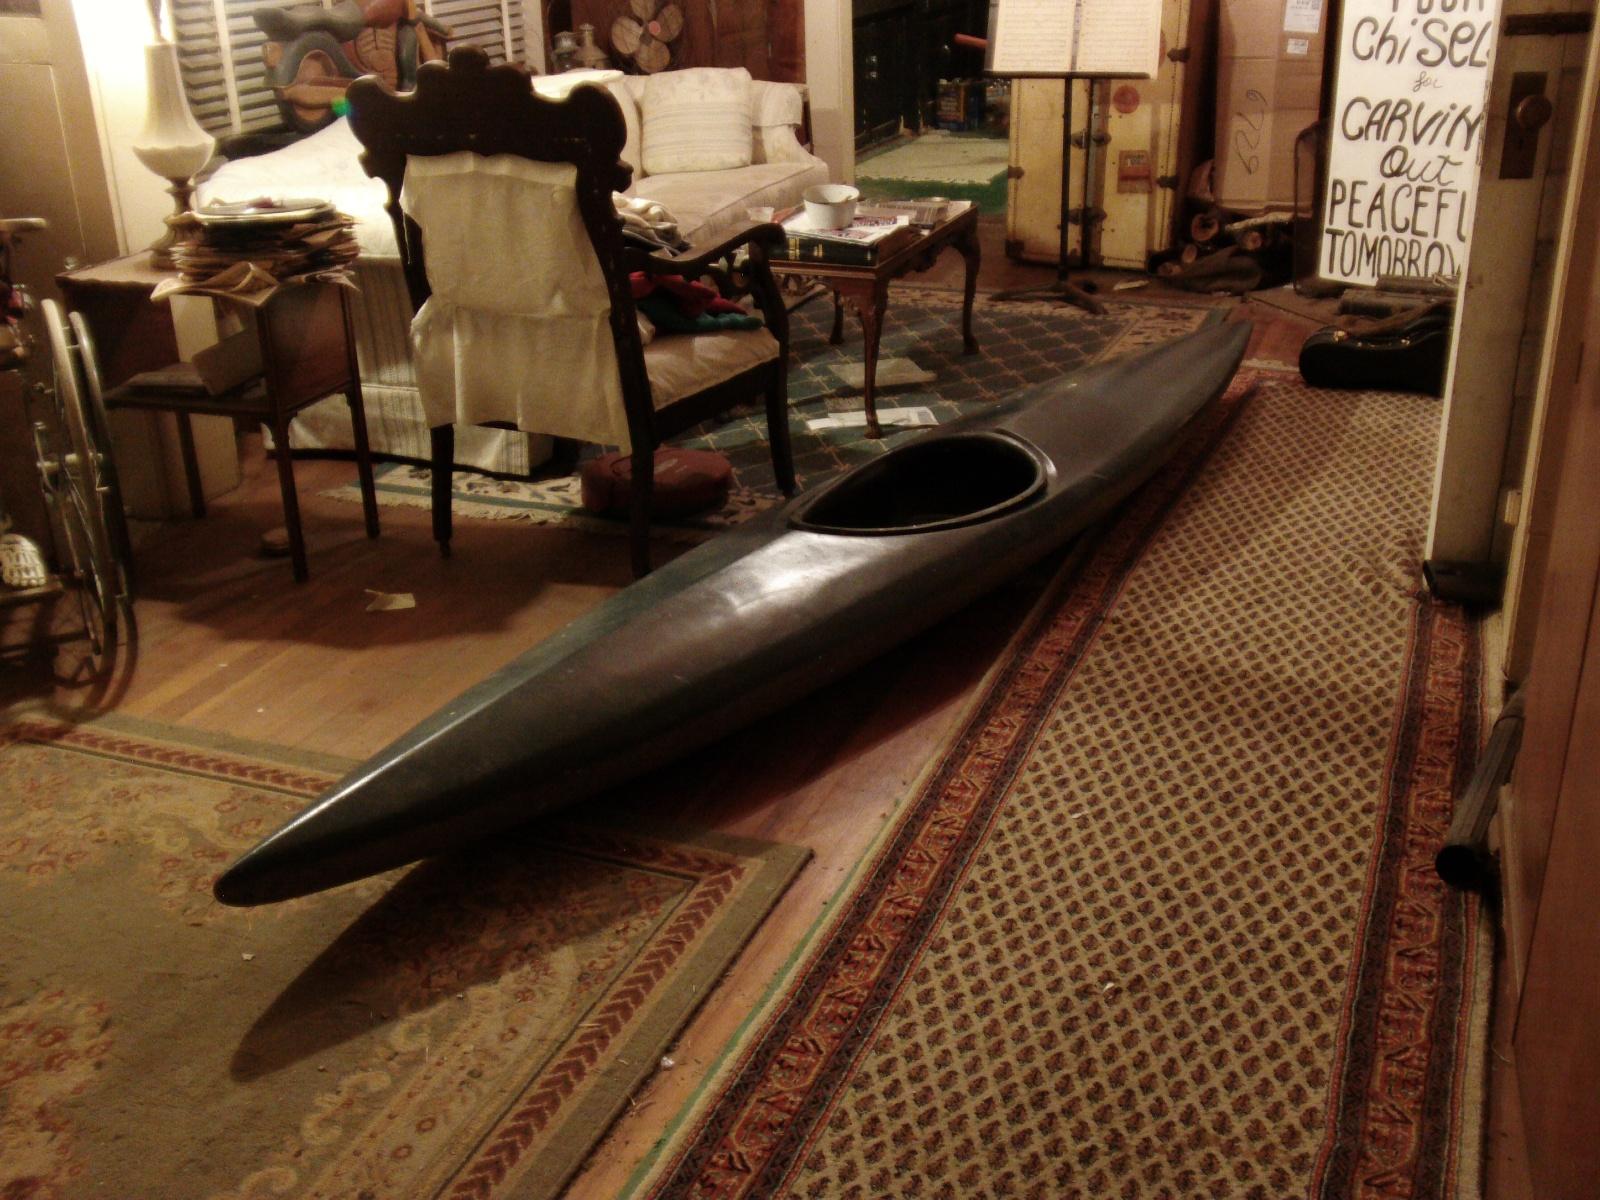 Click image for larger version  Name:old kayak.jpg Views:306 Size:727.3 KB ID:2106